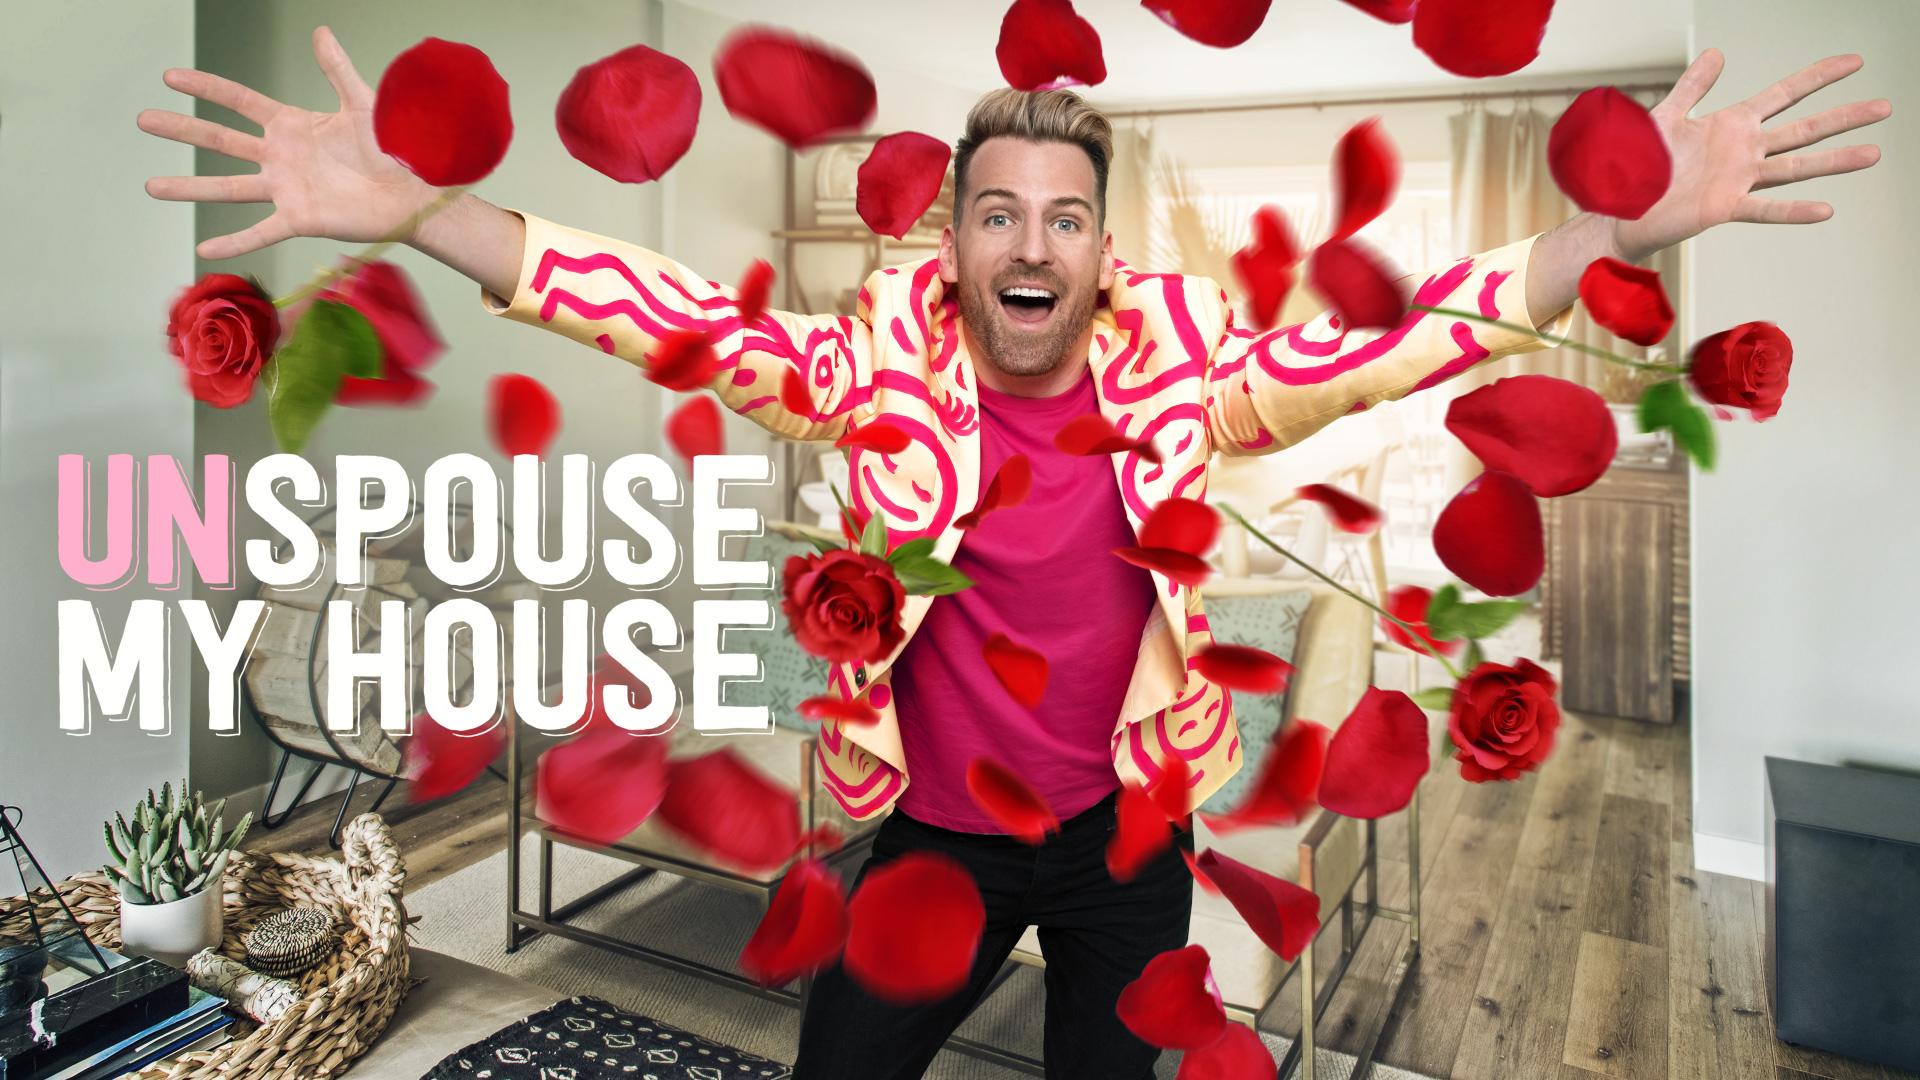 Unspouse-My-House-ShowChip-1920x1080.jpg